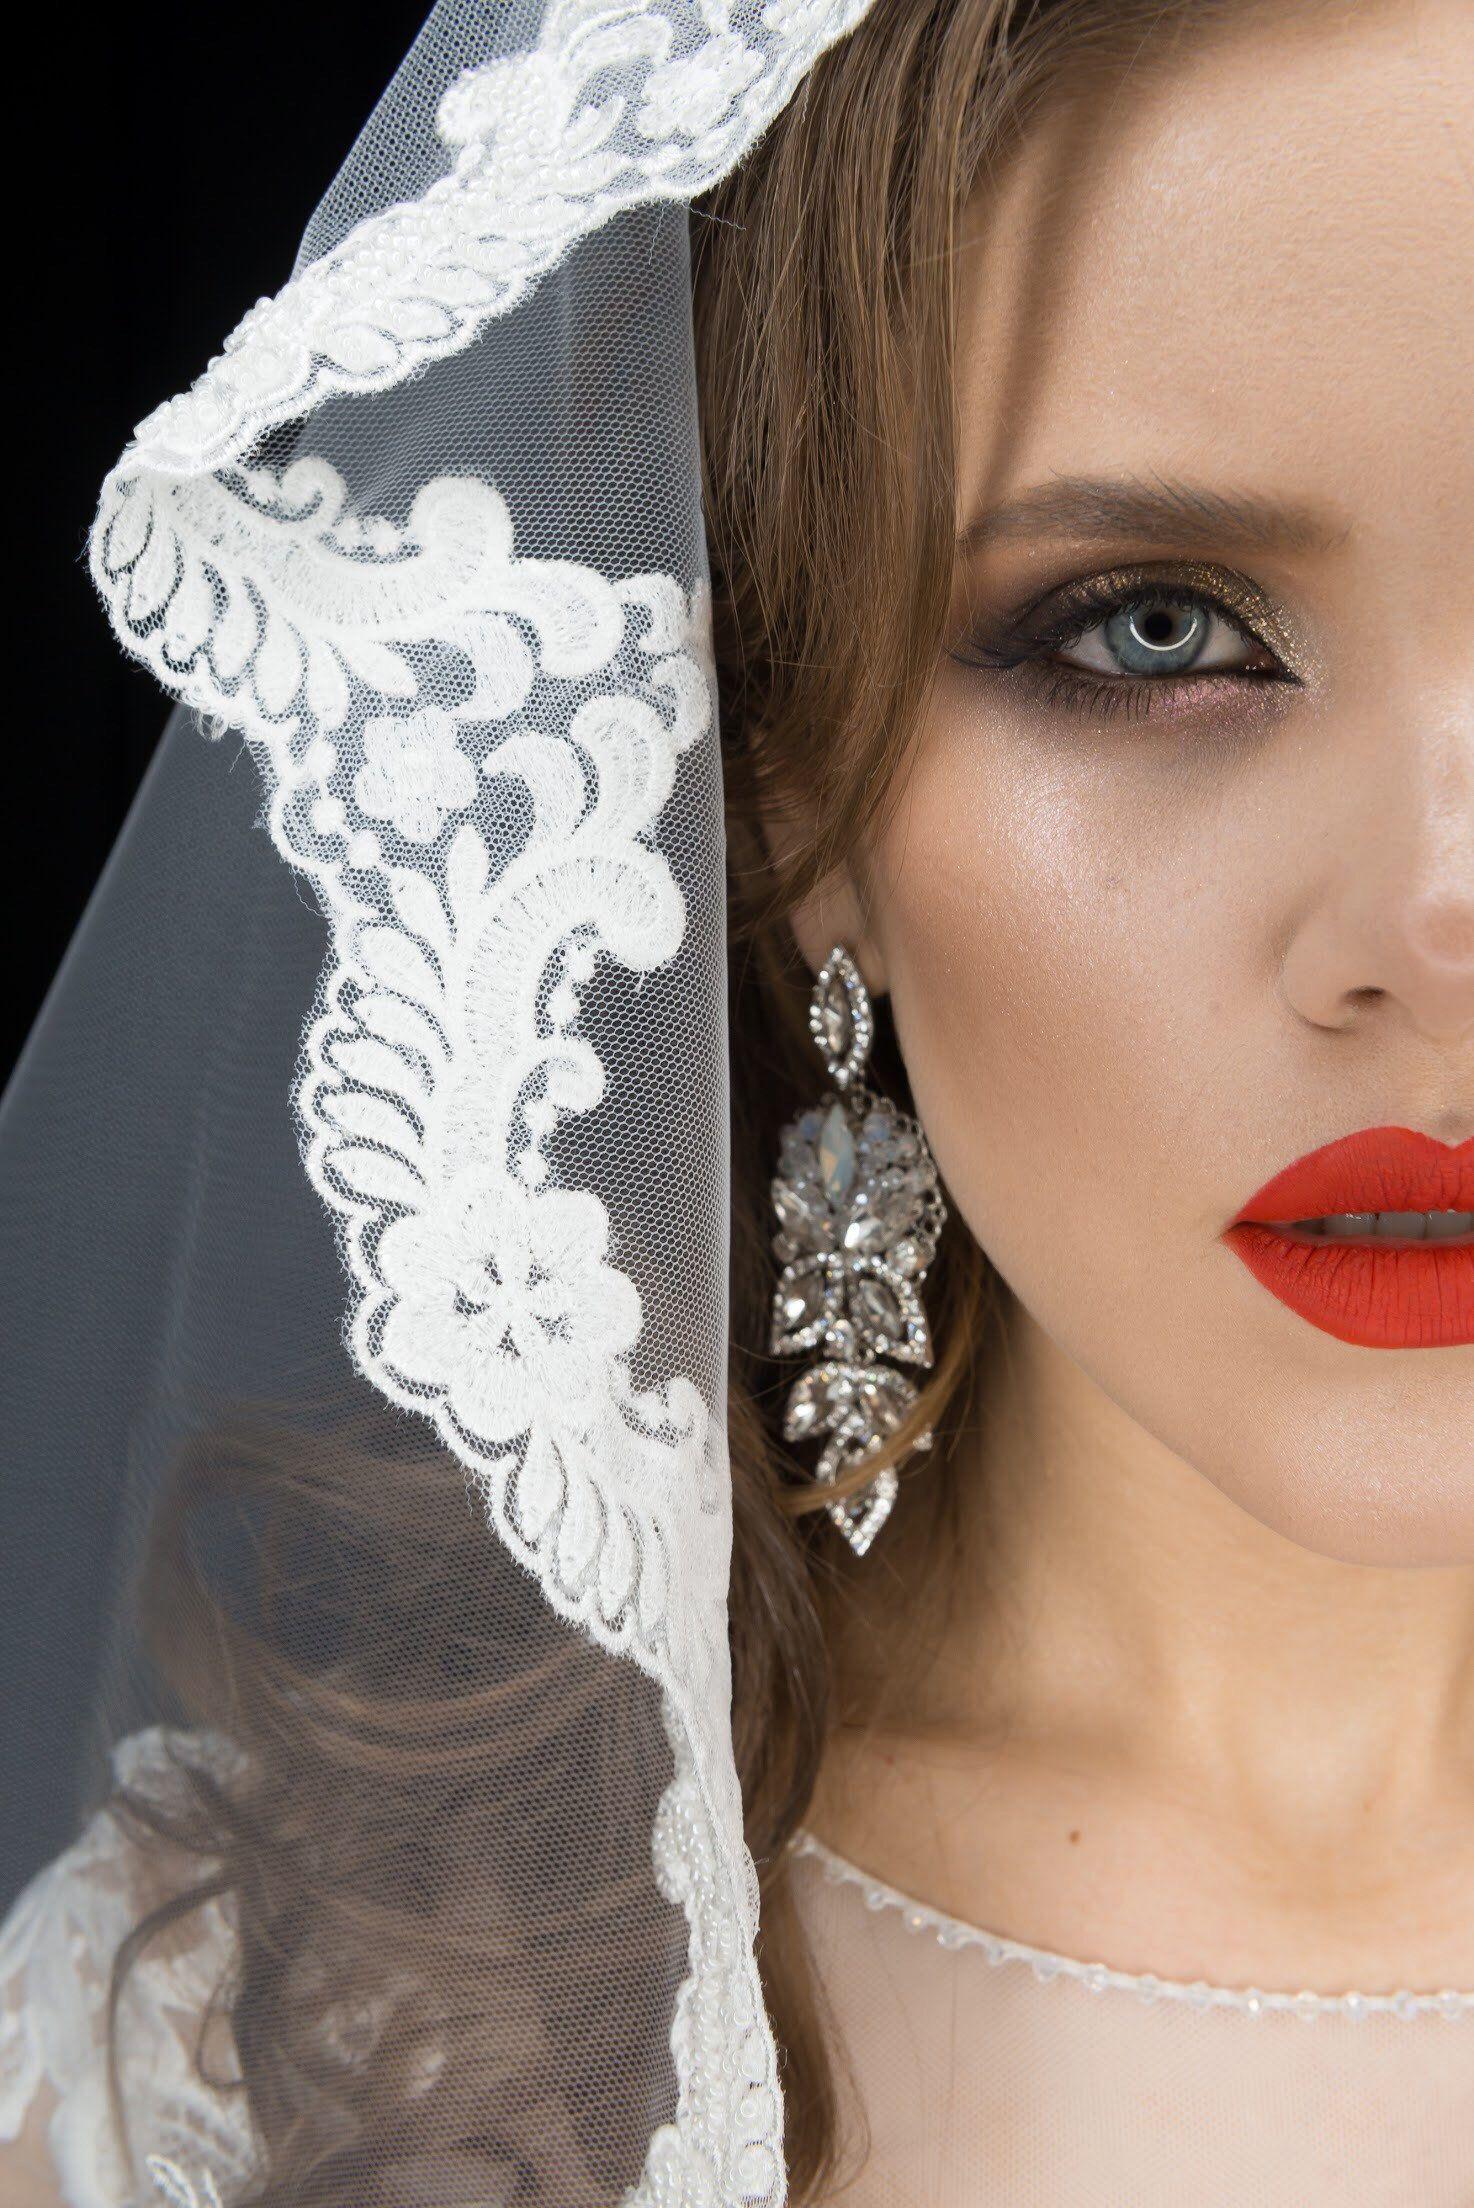 Bridal opal earrings,Swarovski earrings,Bridal earring chandelier,Bridal hairpiece and earring, Silver accessory, Bridal crown earring set,